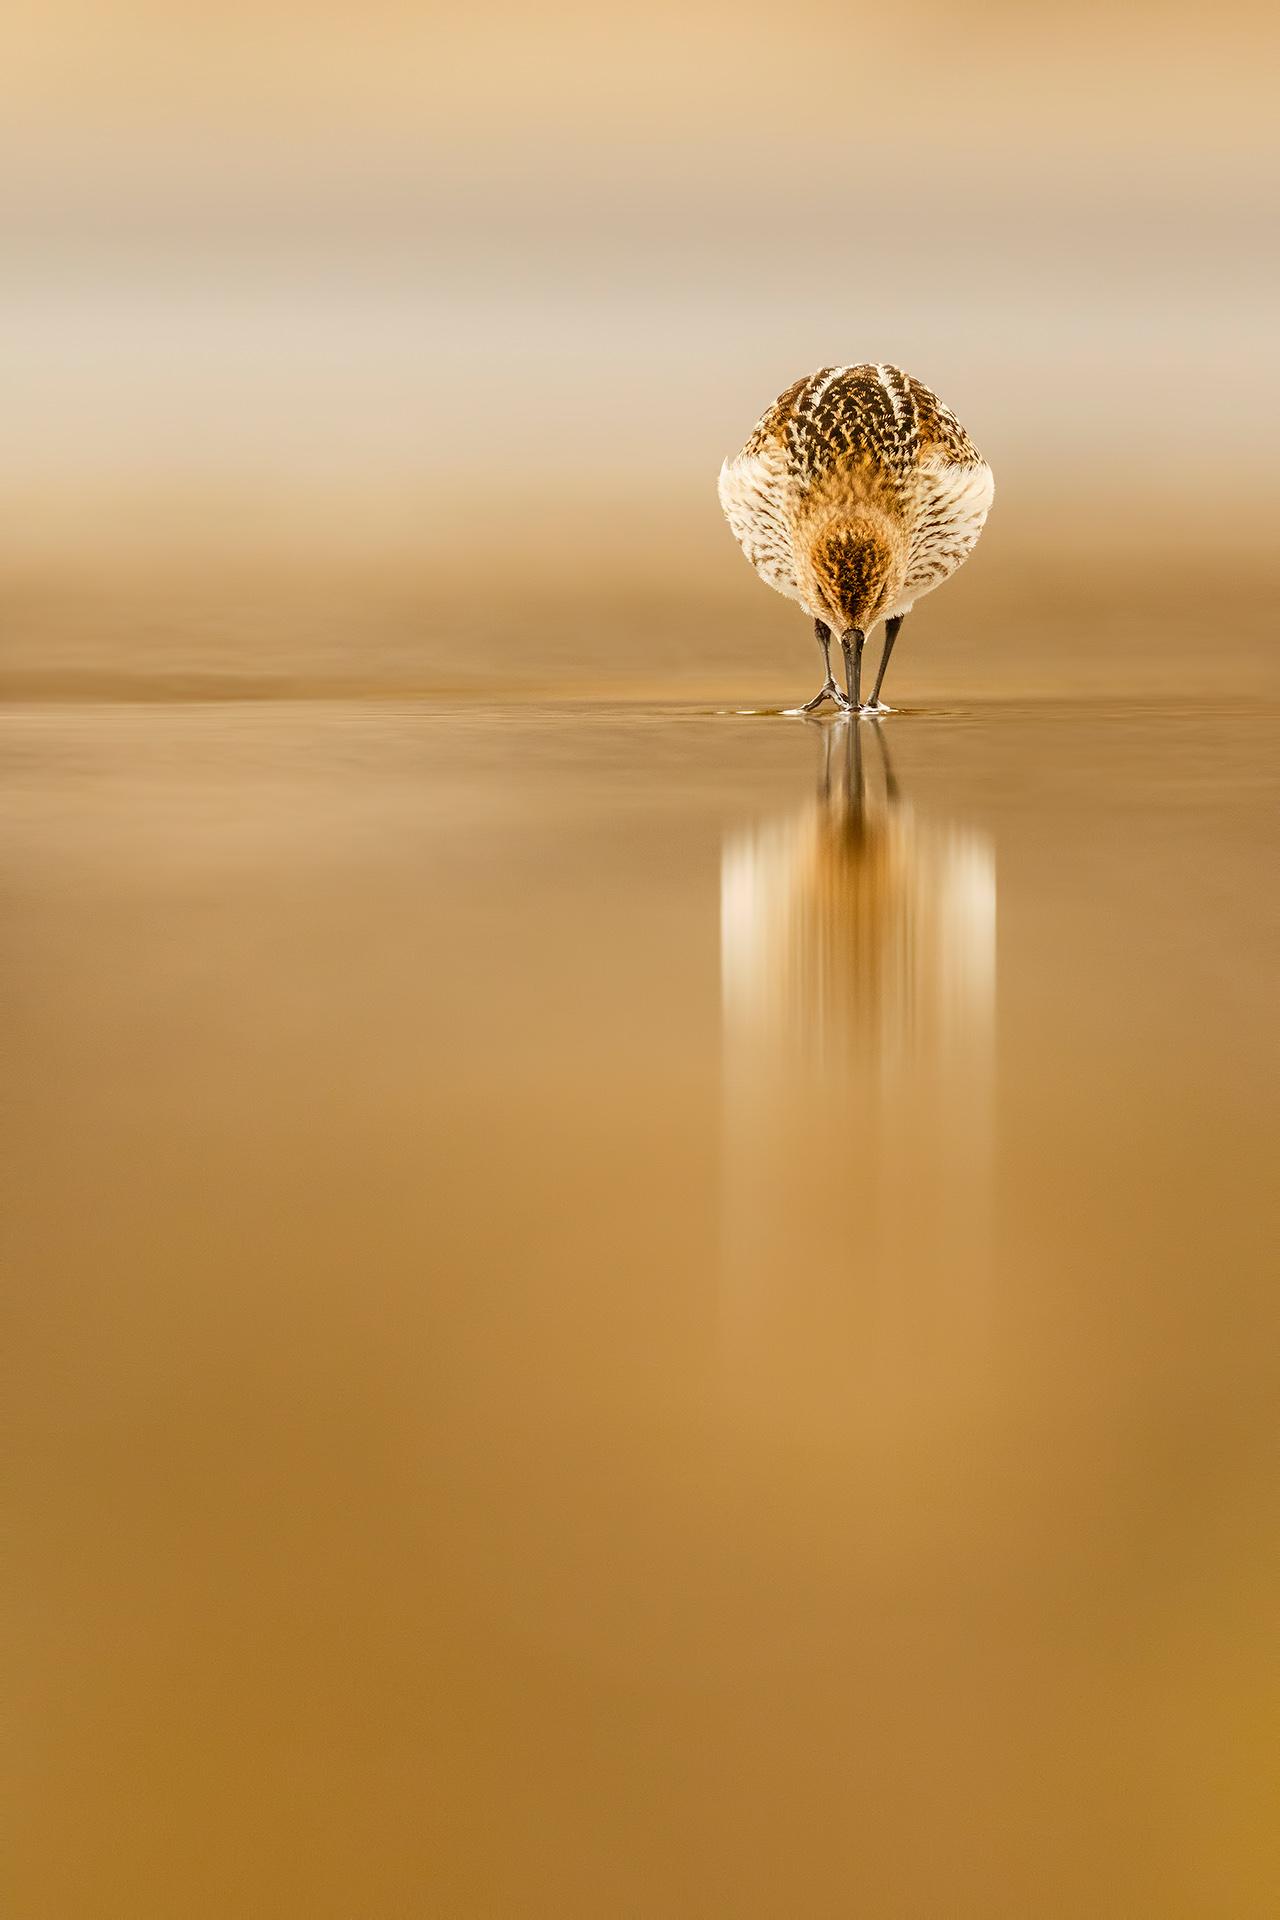 seashore bird - Mario Suarez - Portfolio Natural, Fotografía de Naturaleza de Autor